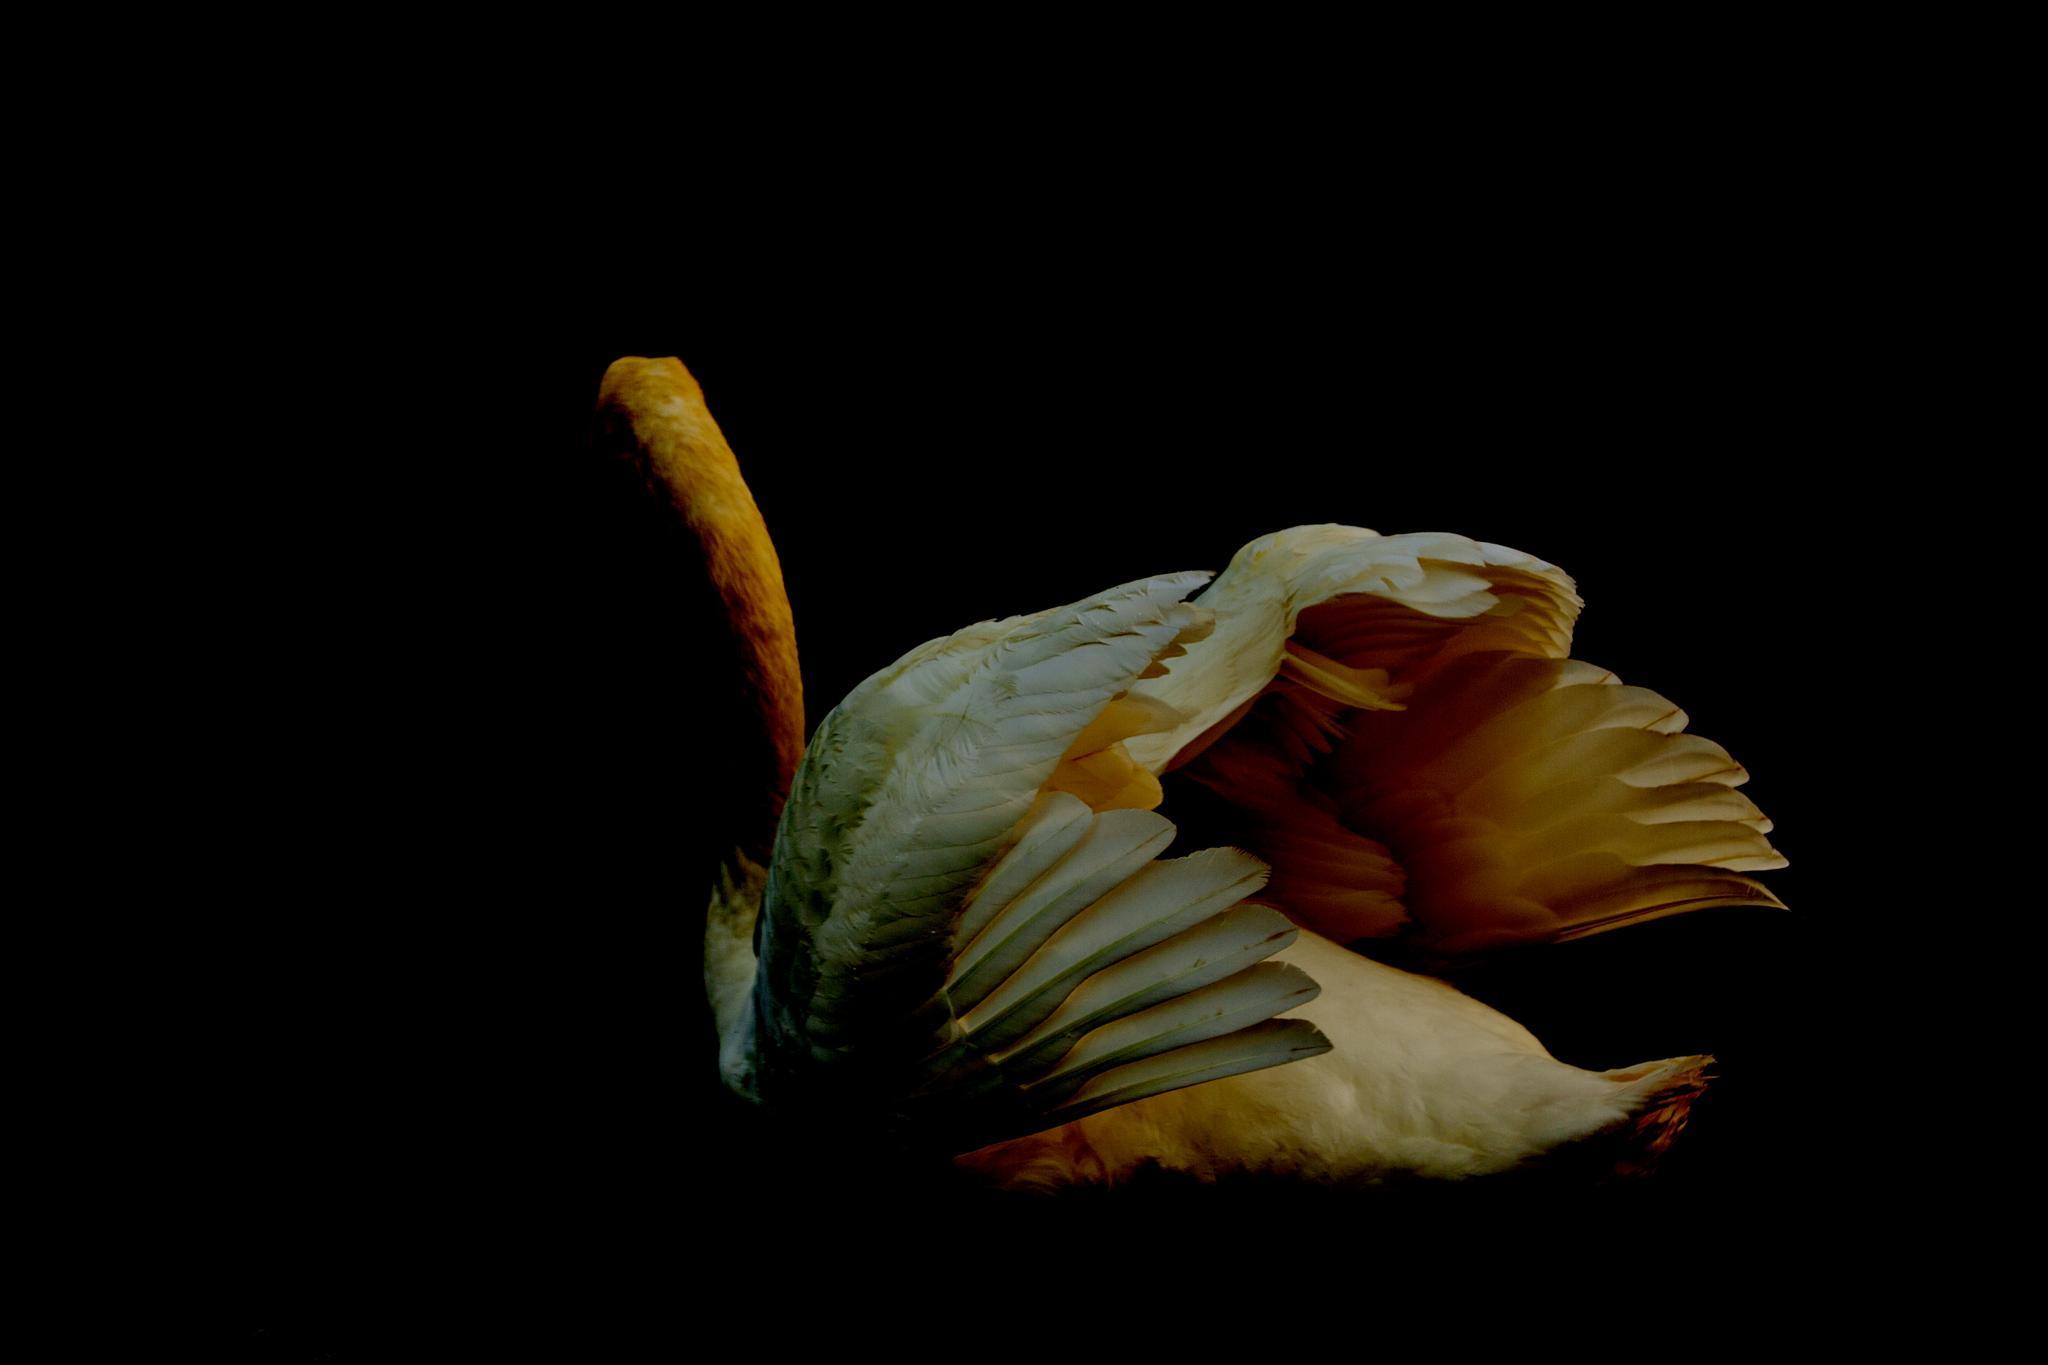 Swan the artist by nader eskandari